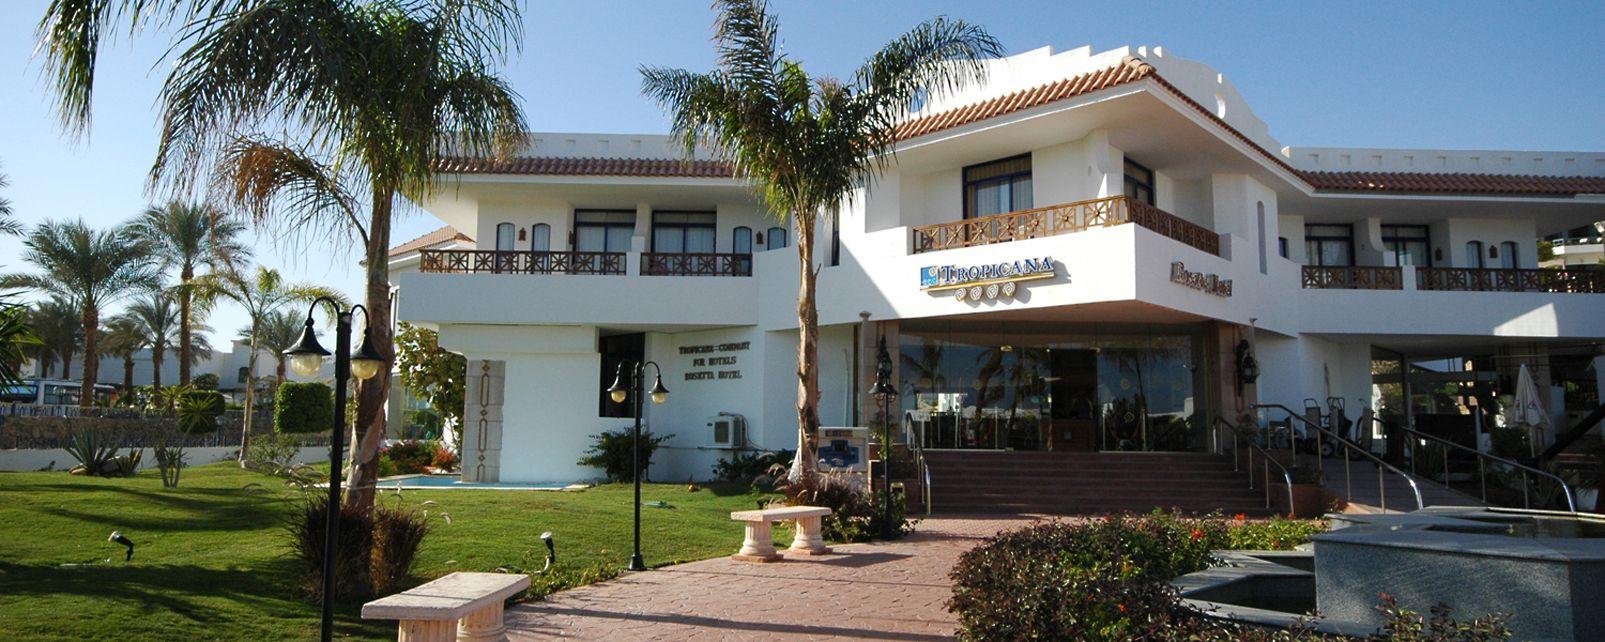 Hôtel Tropicana Rosetta